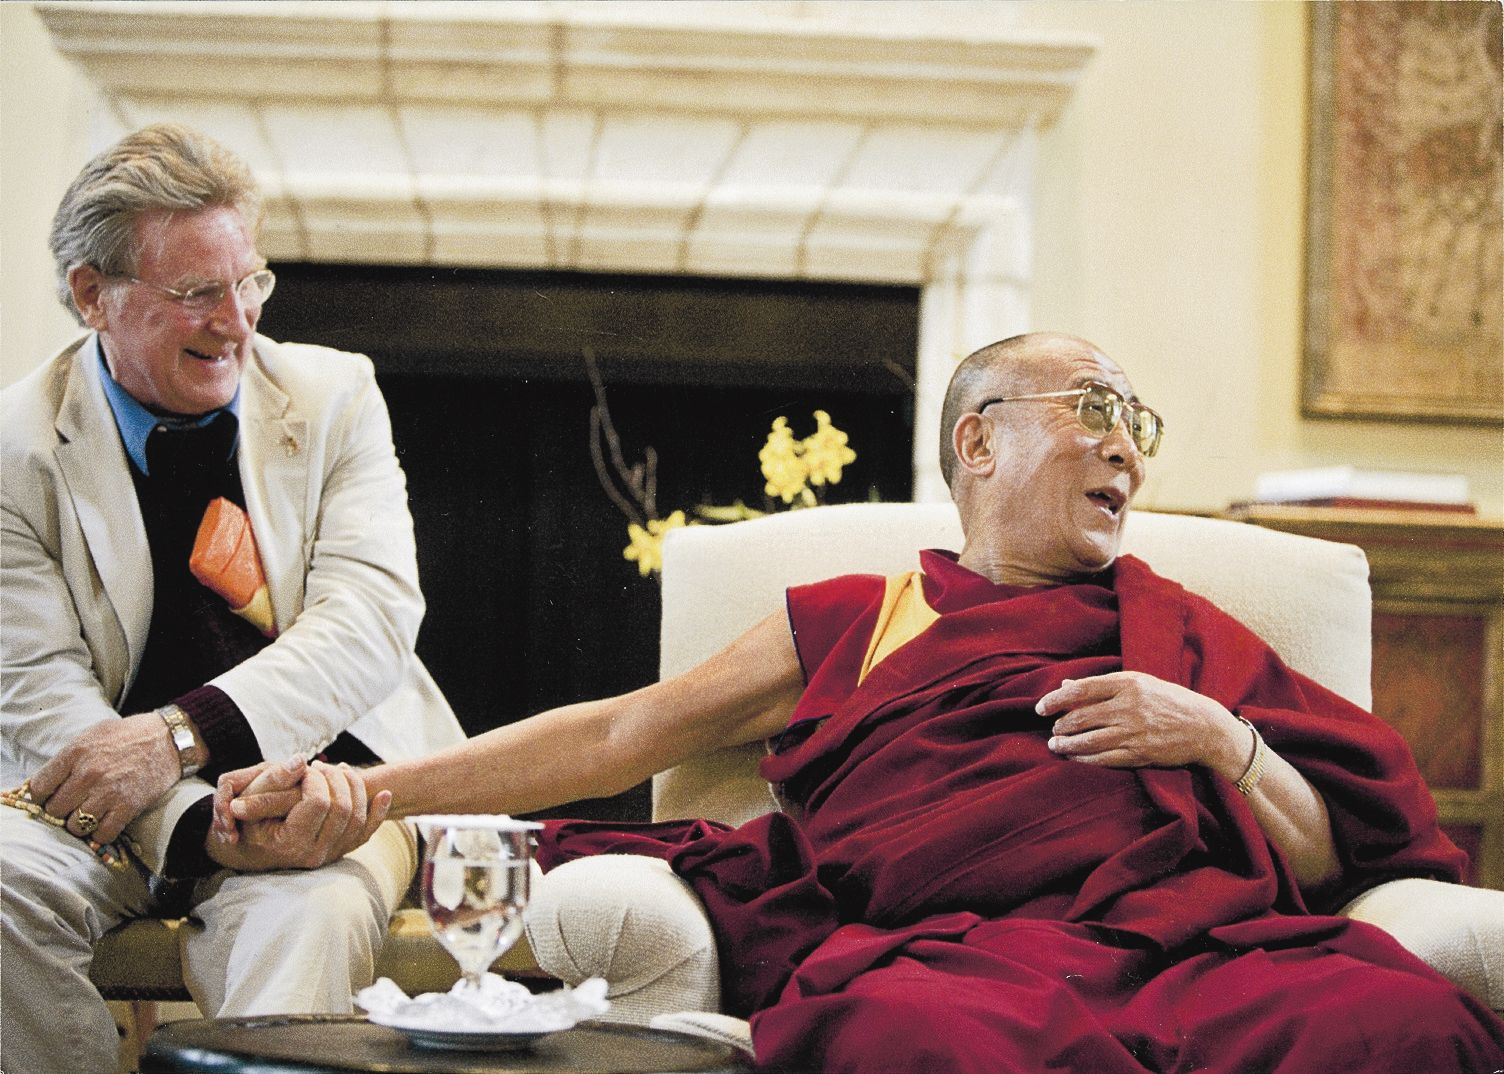 Thurman and Lama